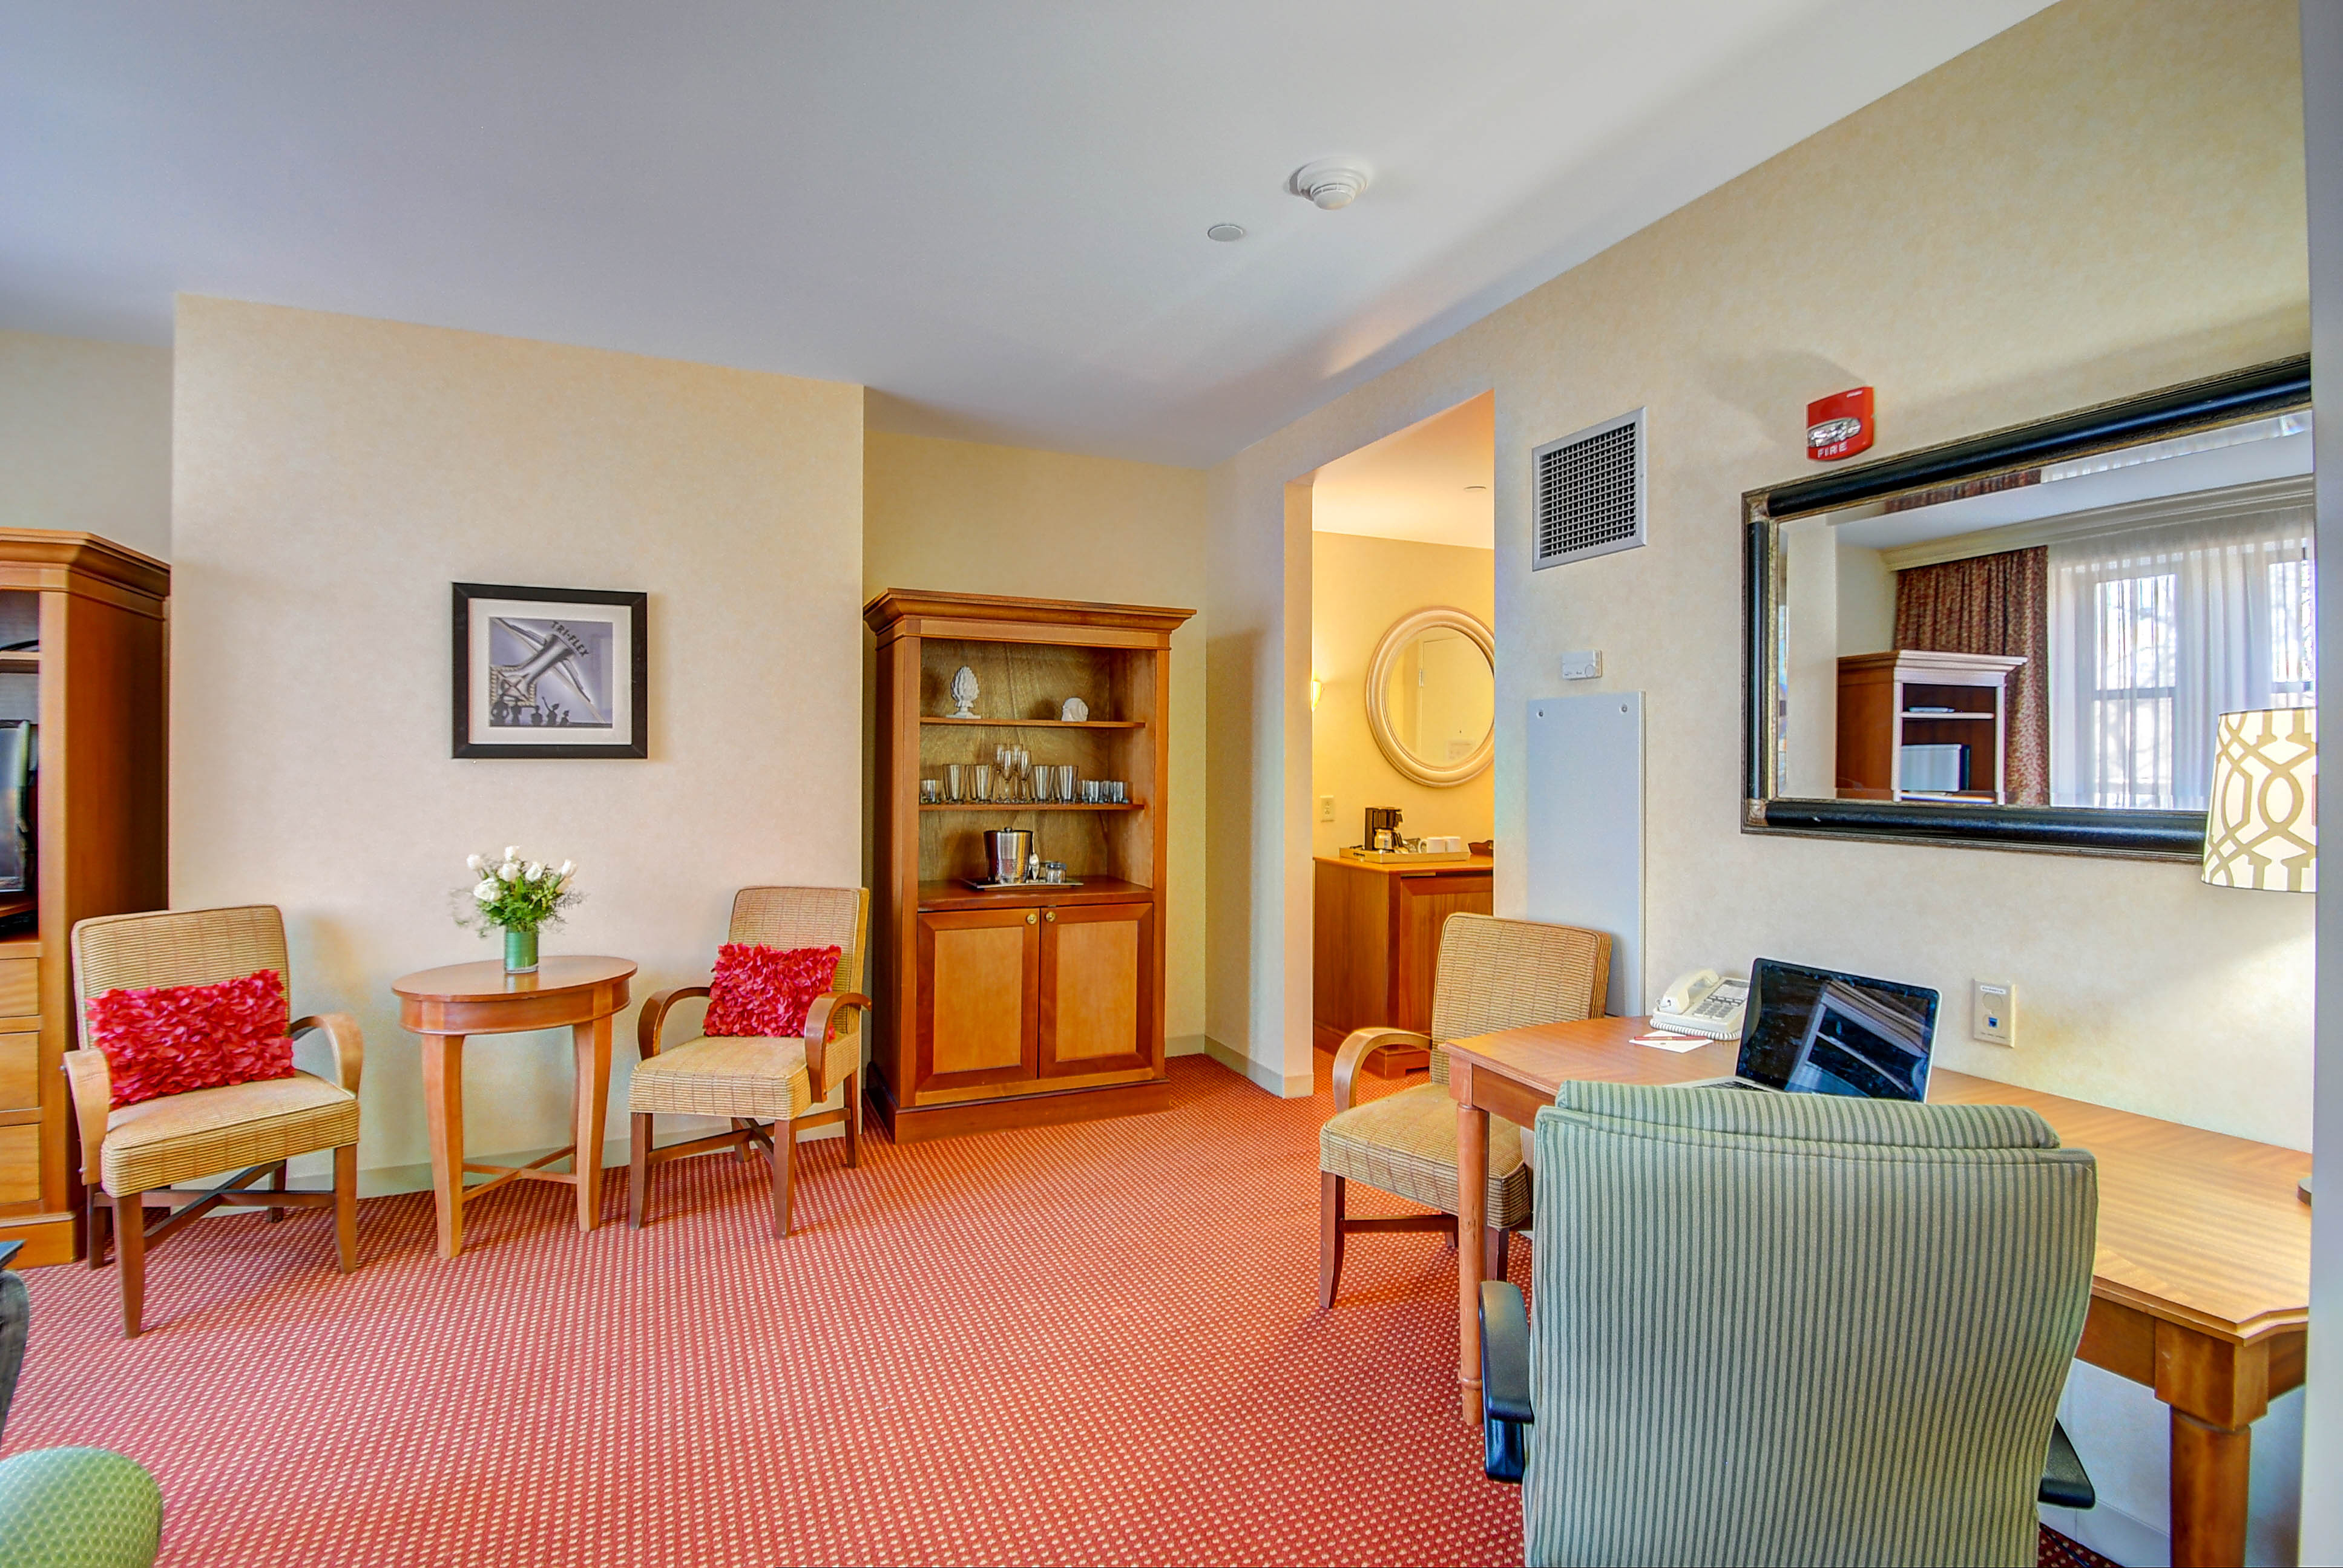 Southbridge Hotel & Conference Center image 4